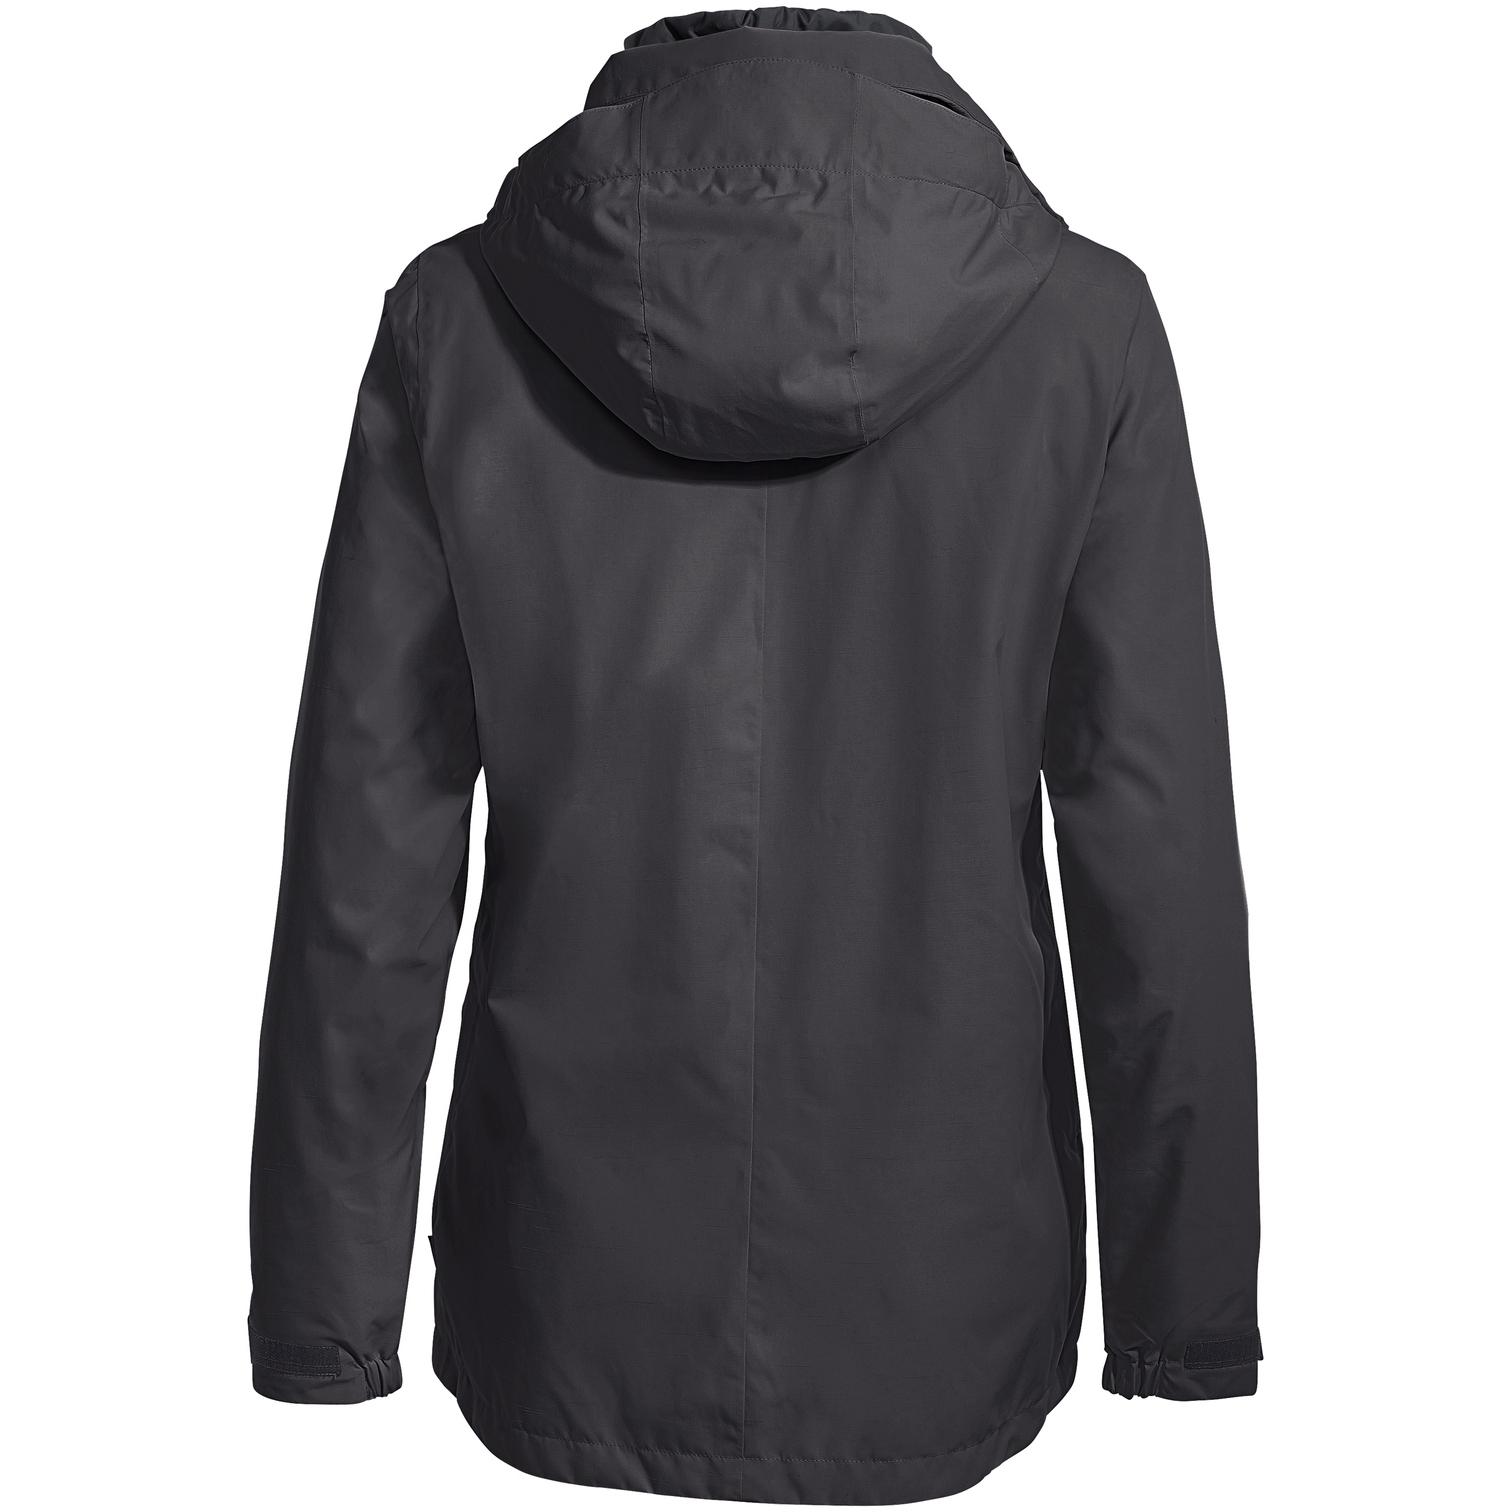 Image of Vaude Women's Skomer 3in1 Jacket - phantom uni